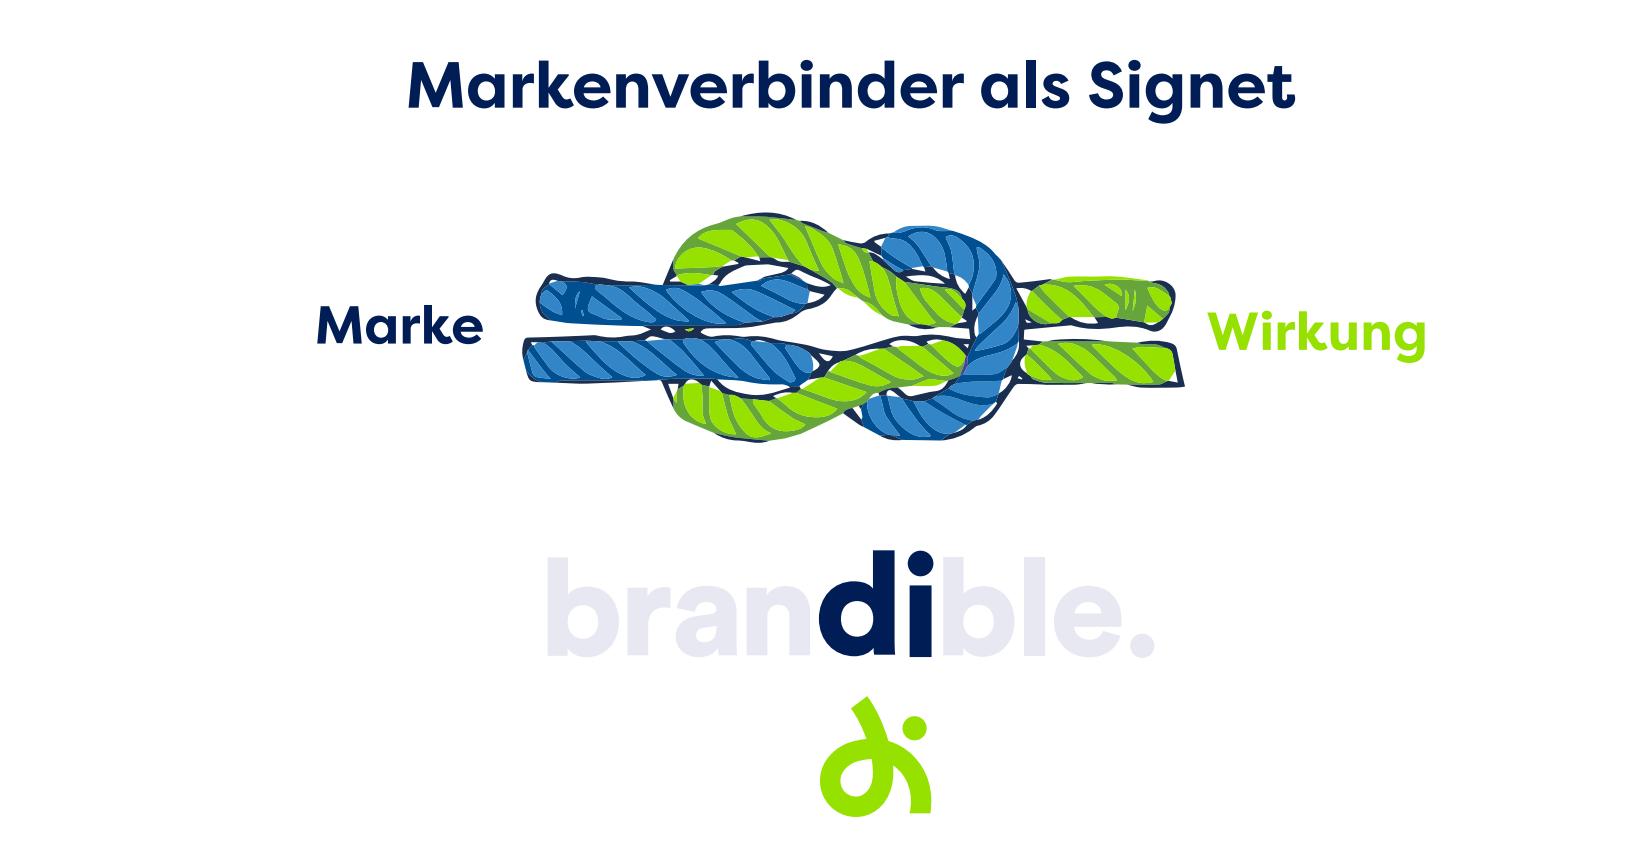 Brandible - Marke & Wirkung